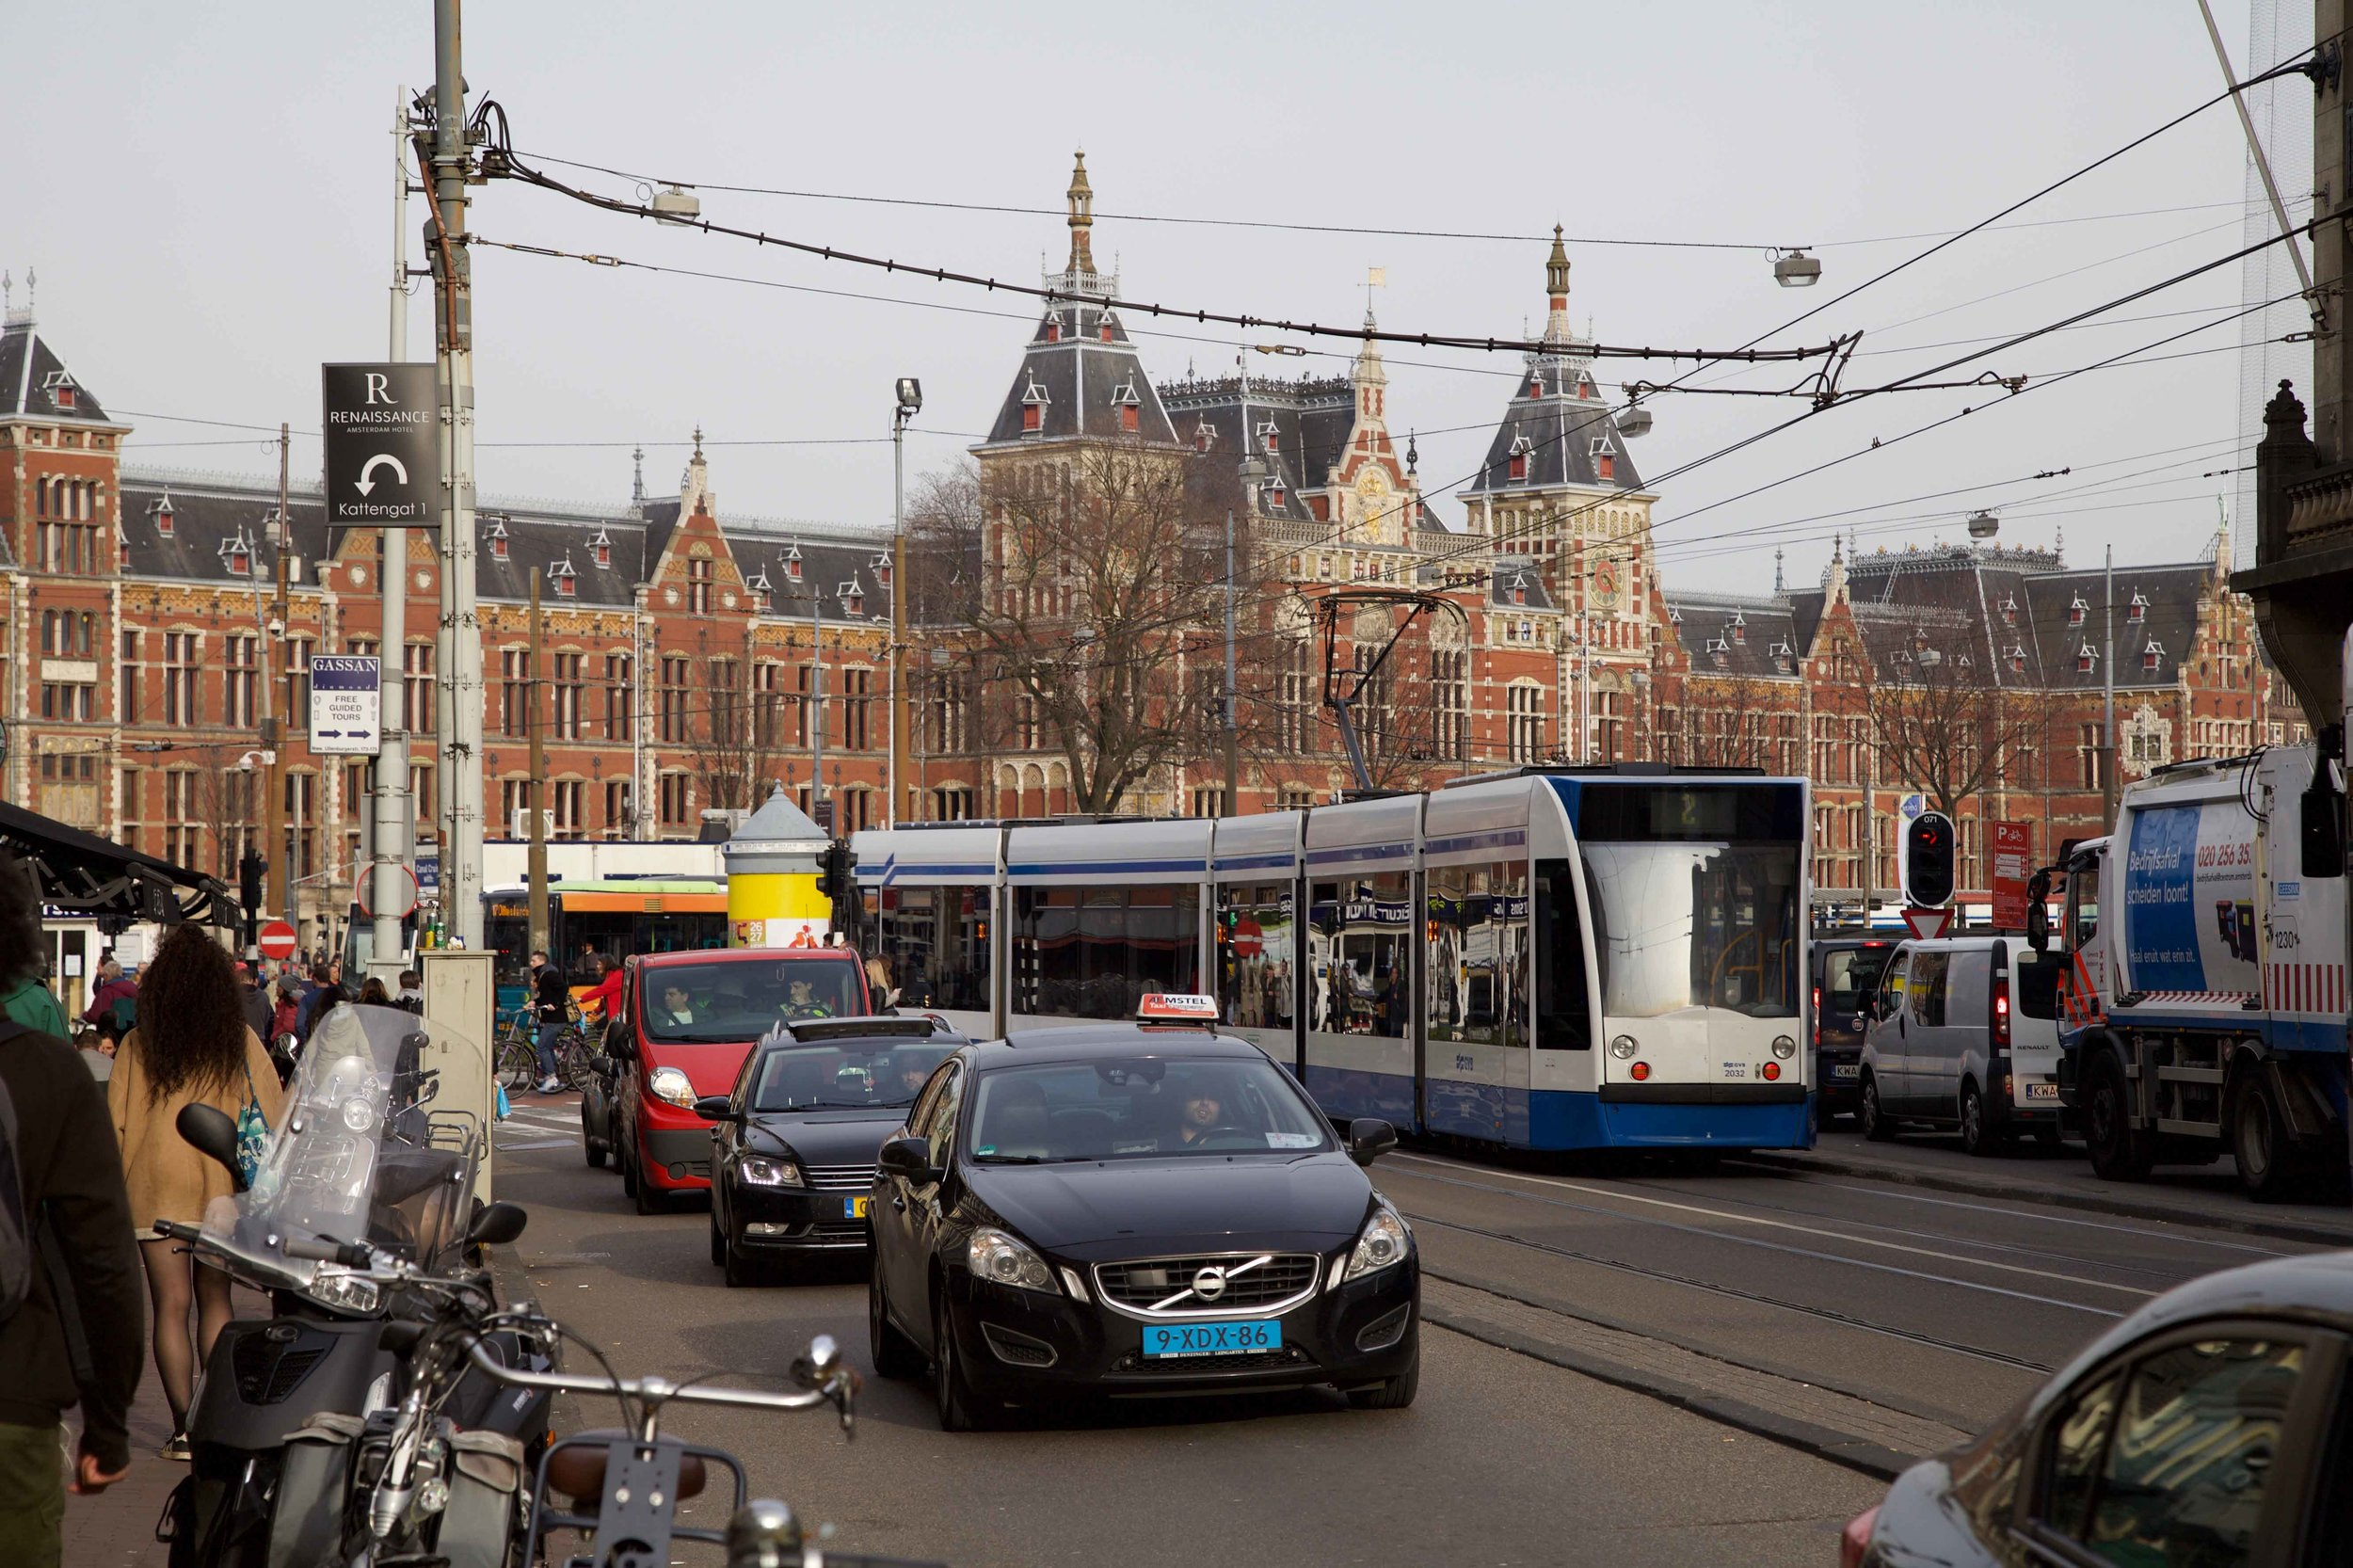 Amsterdam Centraal, train station, Amsterdam. Photo: Fabio Ricci. Image©thingstodot.com